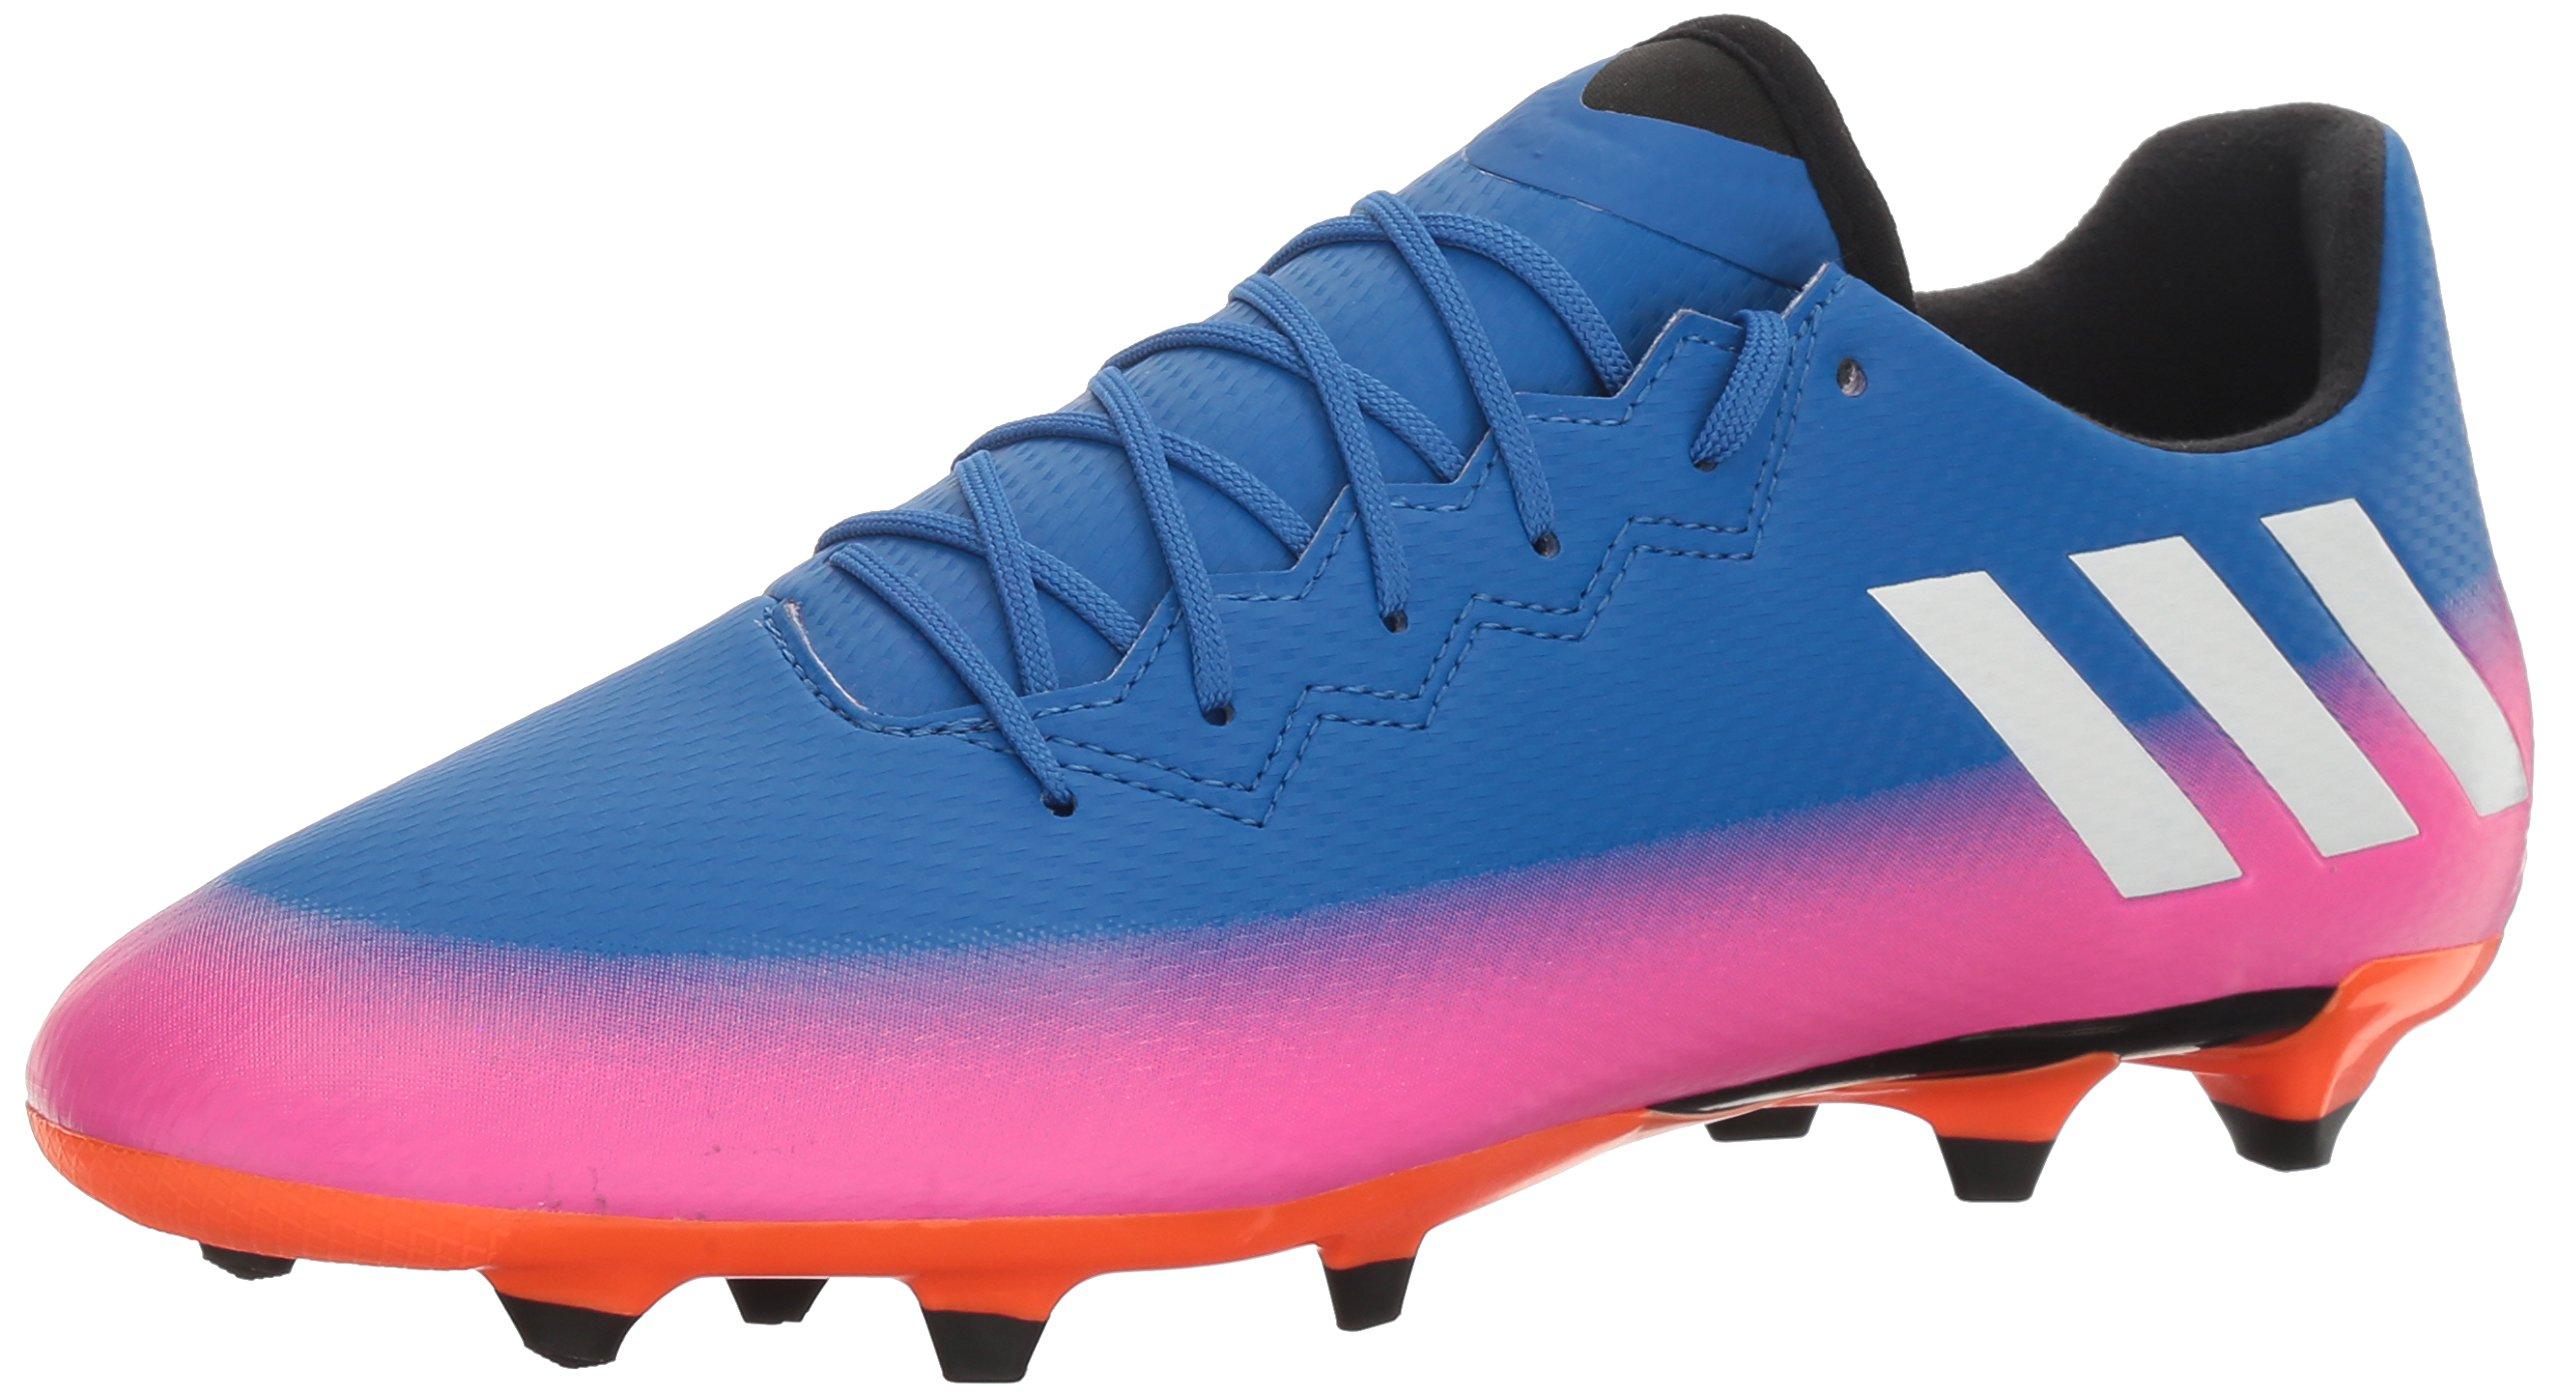 adidas Men's Messi 16.3 FG Soccer Shoe, Blue/White/Warning, (12 M US) by adidas